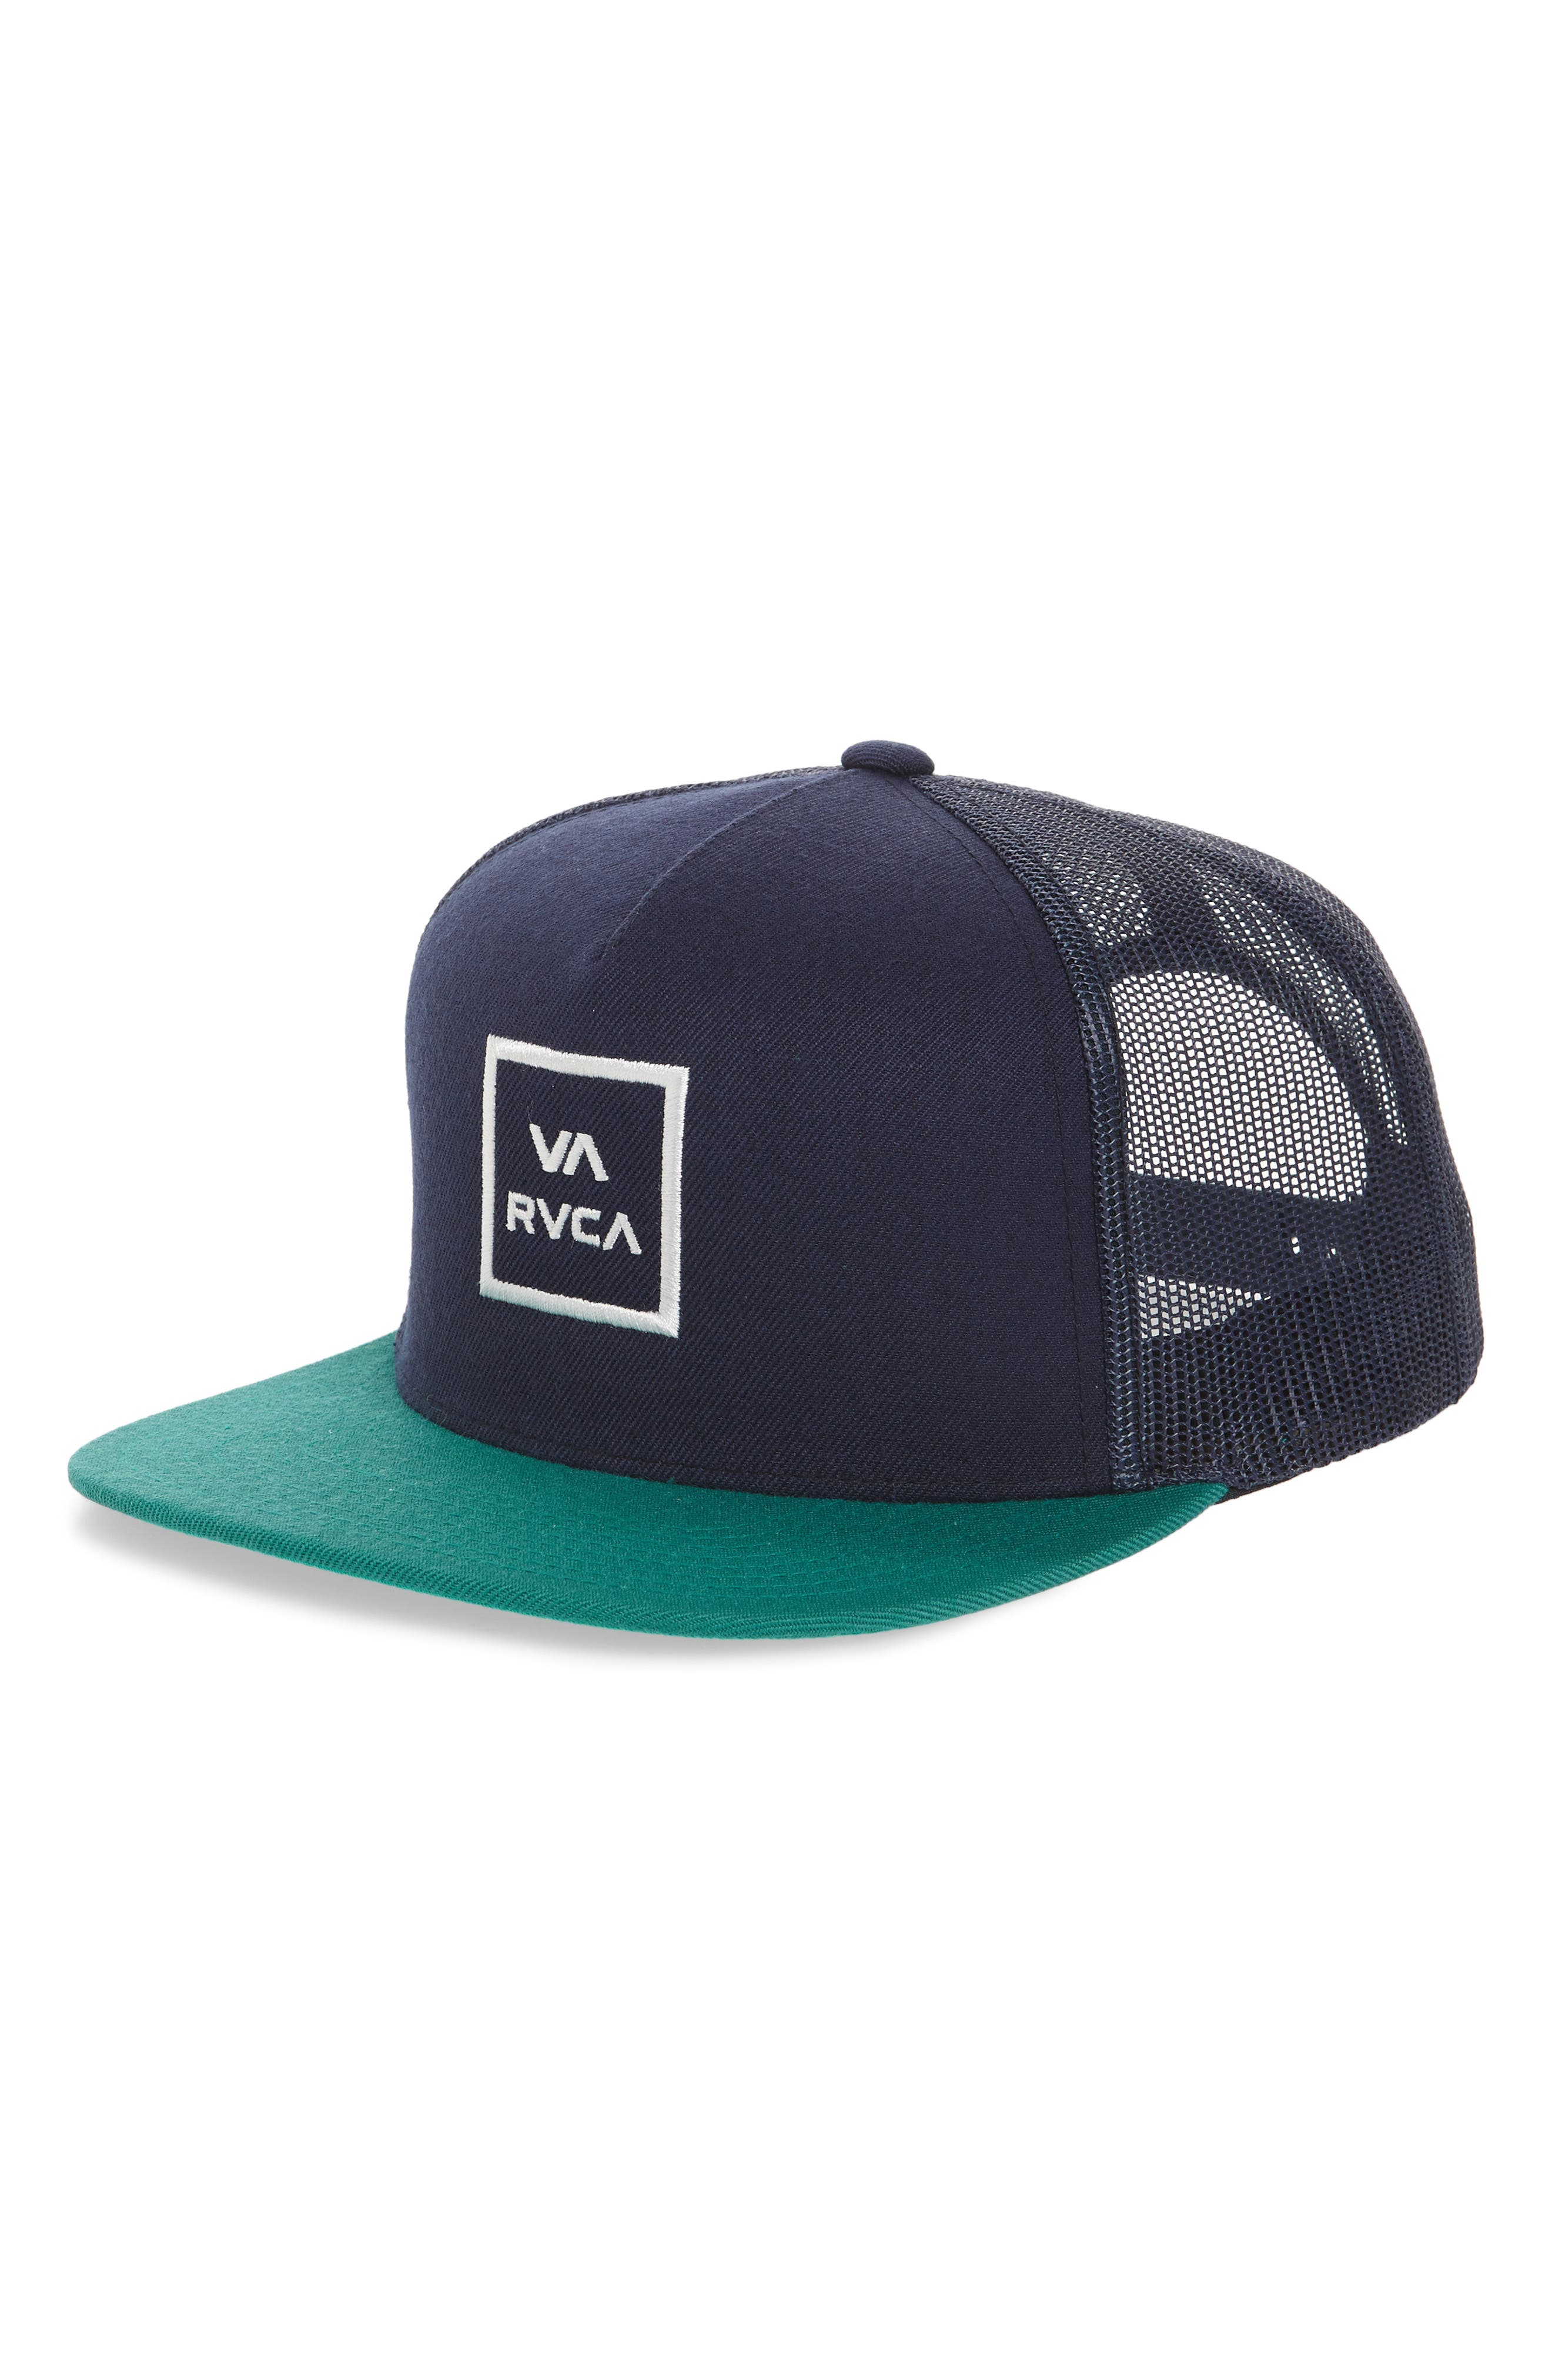 VA All the Way Trucker Hat,                         Main,                         color, Navy/ Teal